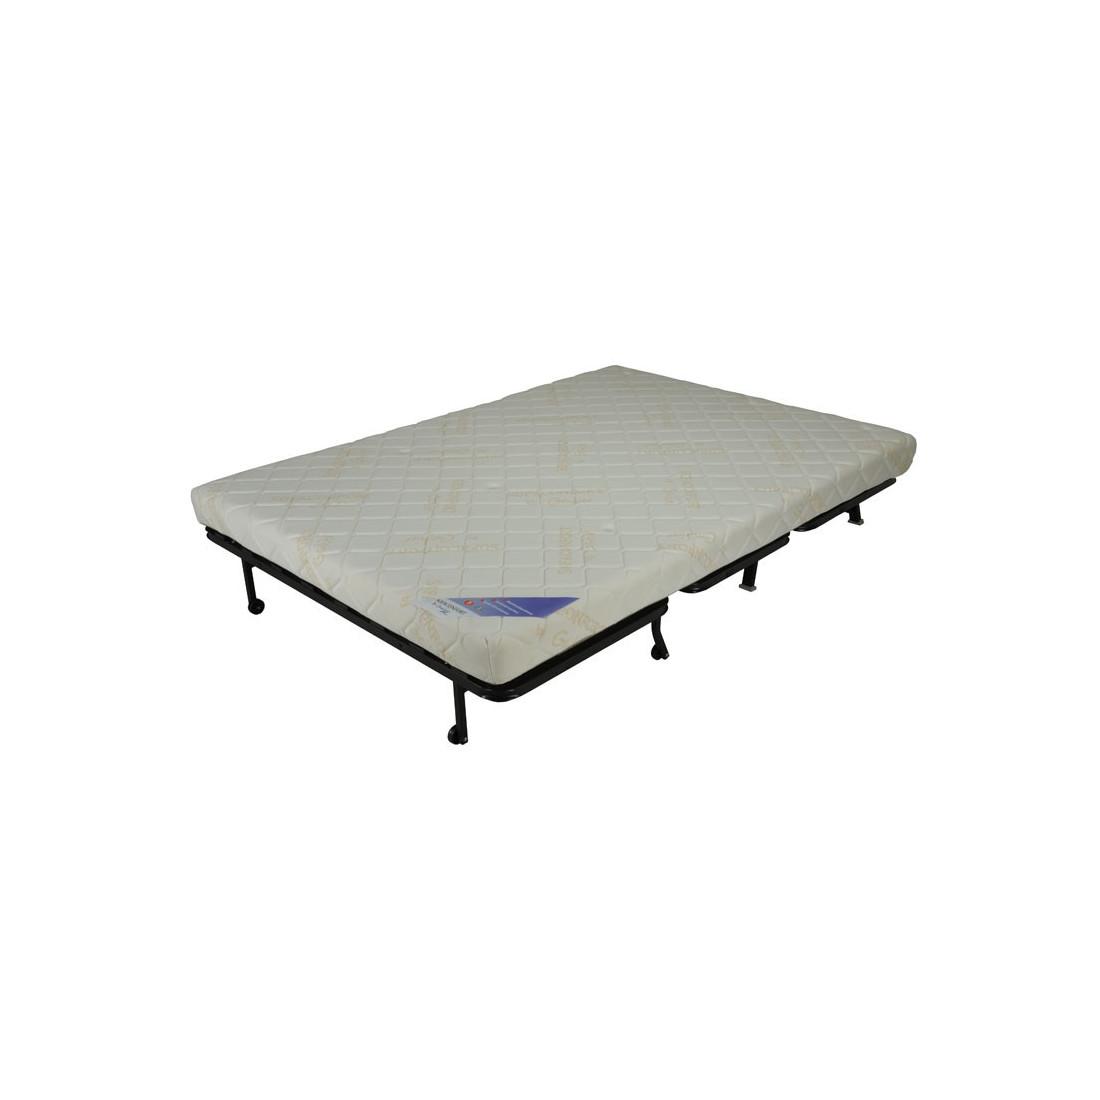 banquette lit bz tissu rouge uni couss matelas hr 140 cm speed capy. Black Bedroom Furniture Sets. Home Design Ideas